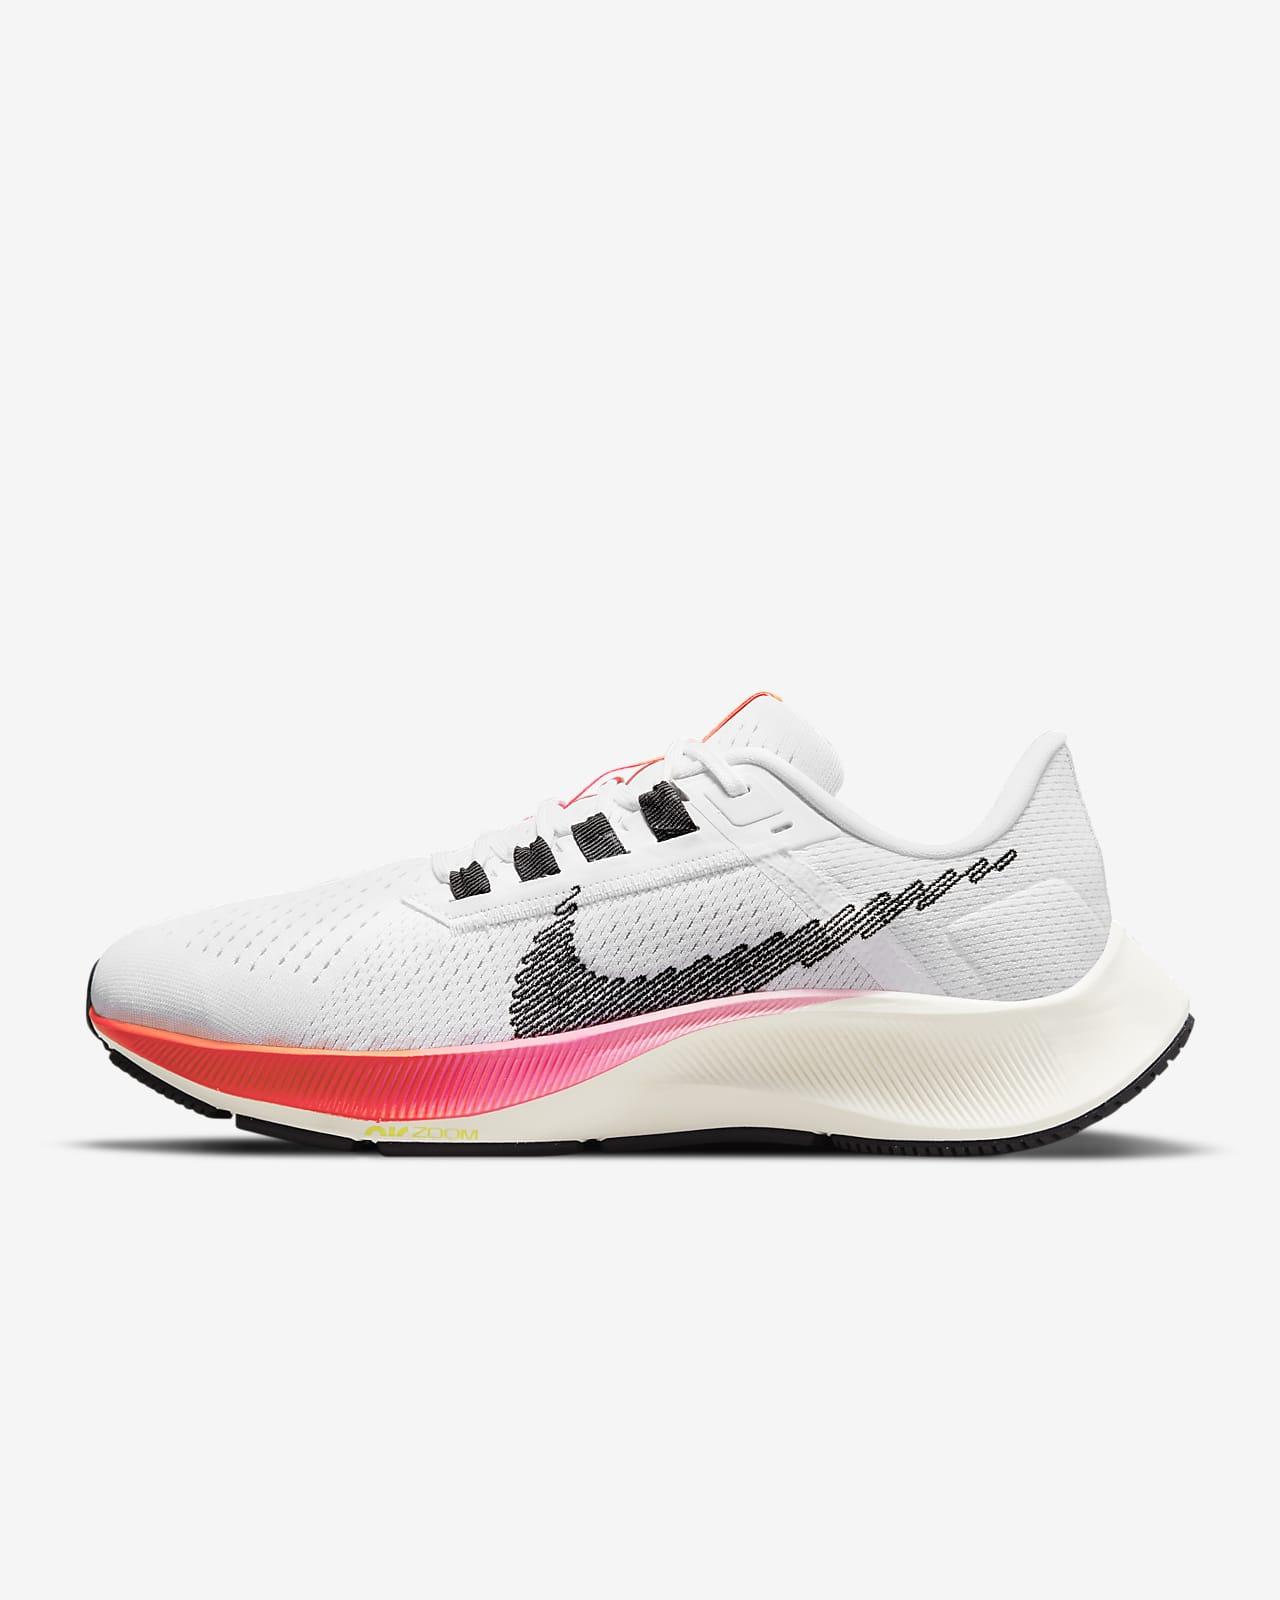 Nike Air Zoom Pegasus 38 Women's Road Running Shoe. Nike LU